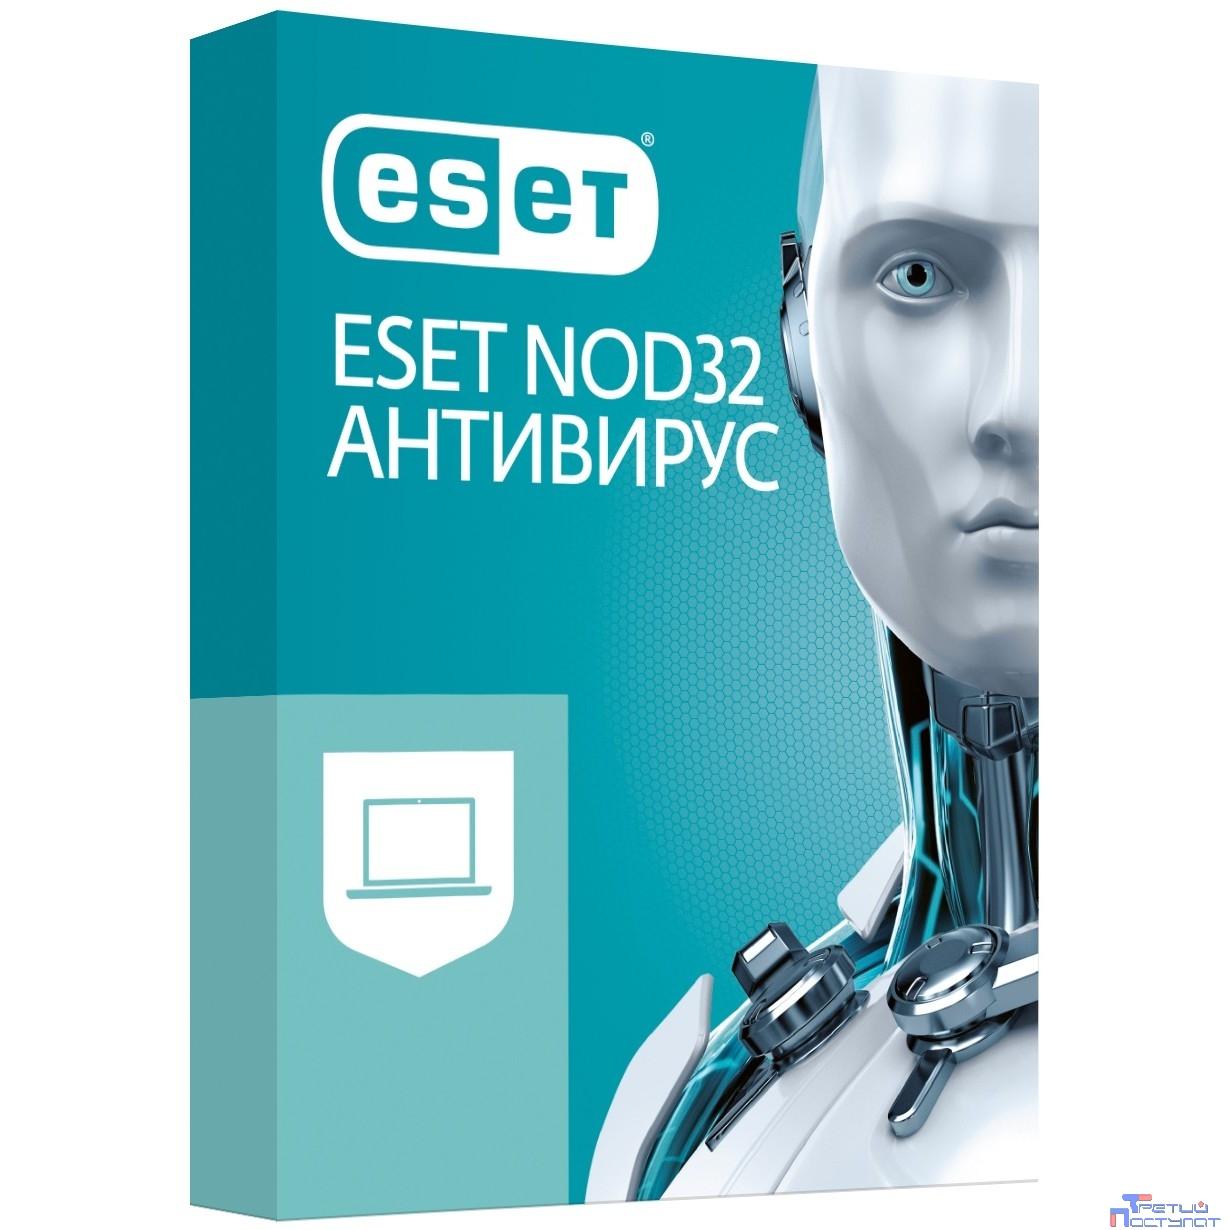 NOD32-ENA-NS(BOX)-2-1 ESET NOD32 Антивирус Platinum Edition [лицензия на 2 года на 3 ПК]